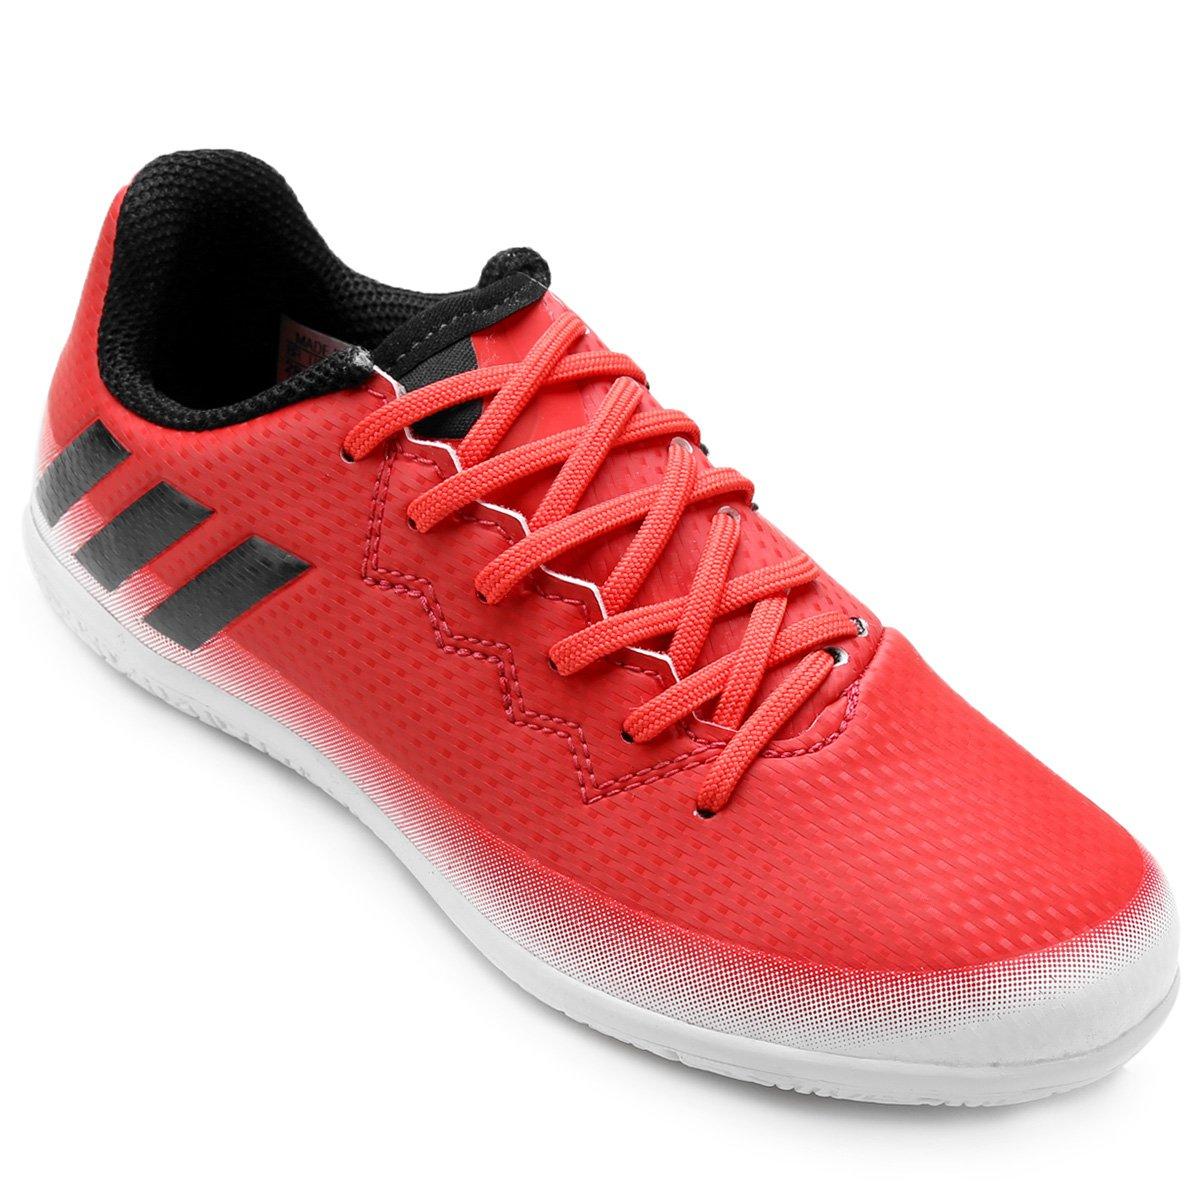 517b15a212 Chuteira Futsal Infantil Adidas Messi 16.3 IN - Compre Agora